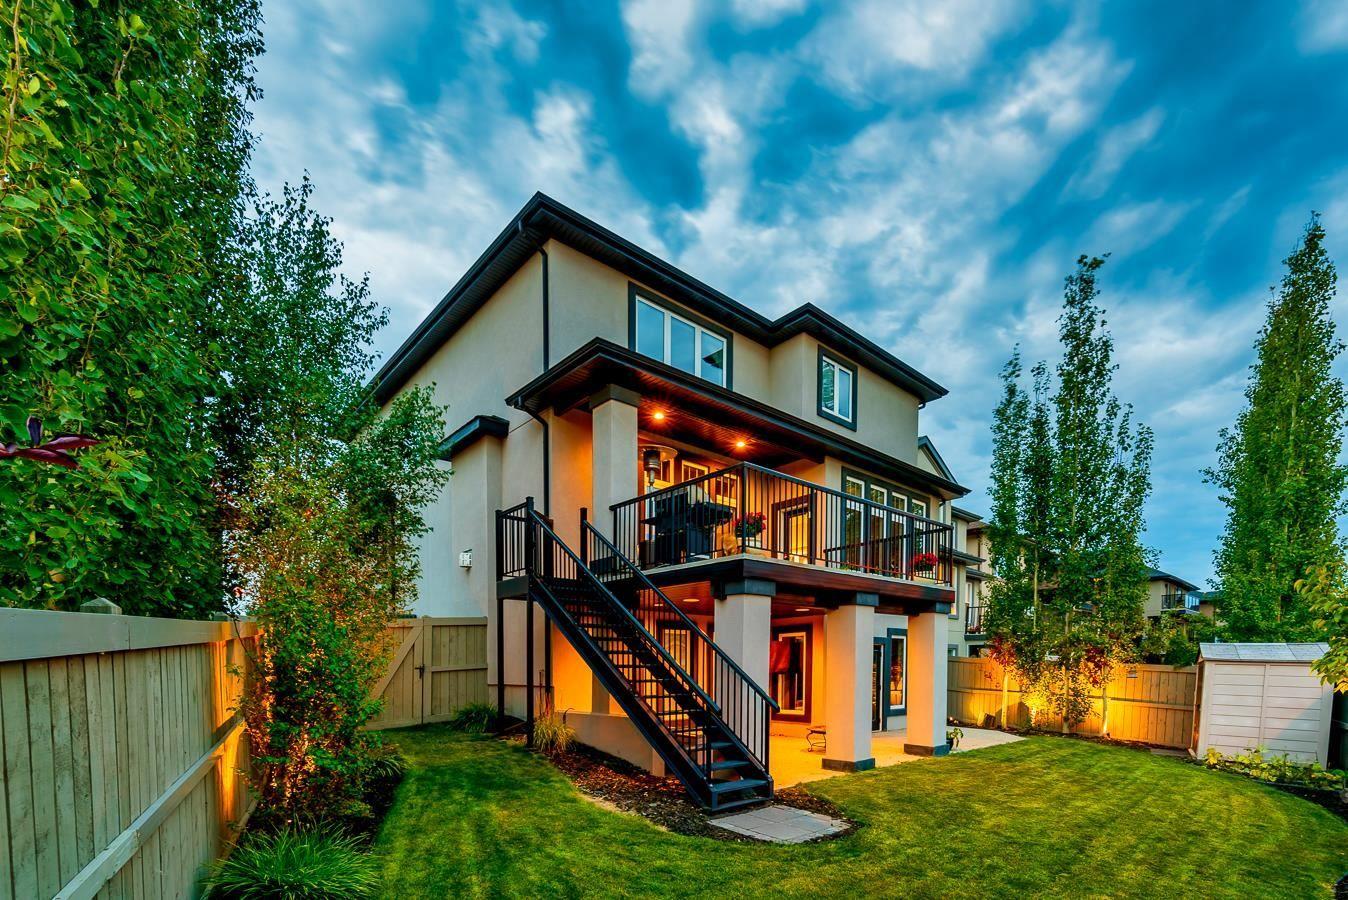 Main Photo: 2728 WATCHER Way in Edmonton: Zone 56 House for sale : MLS®# E4262374